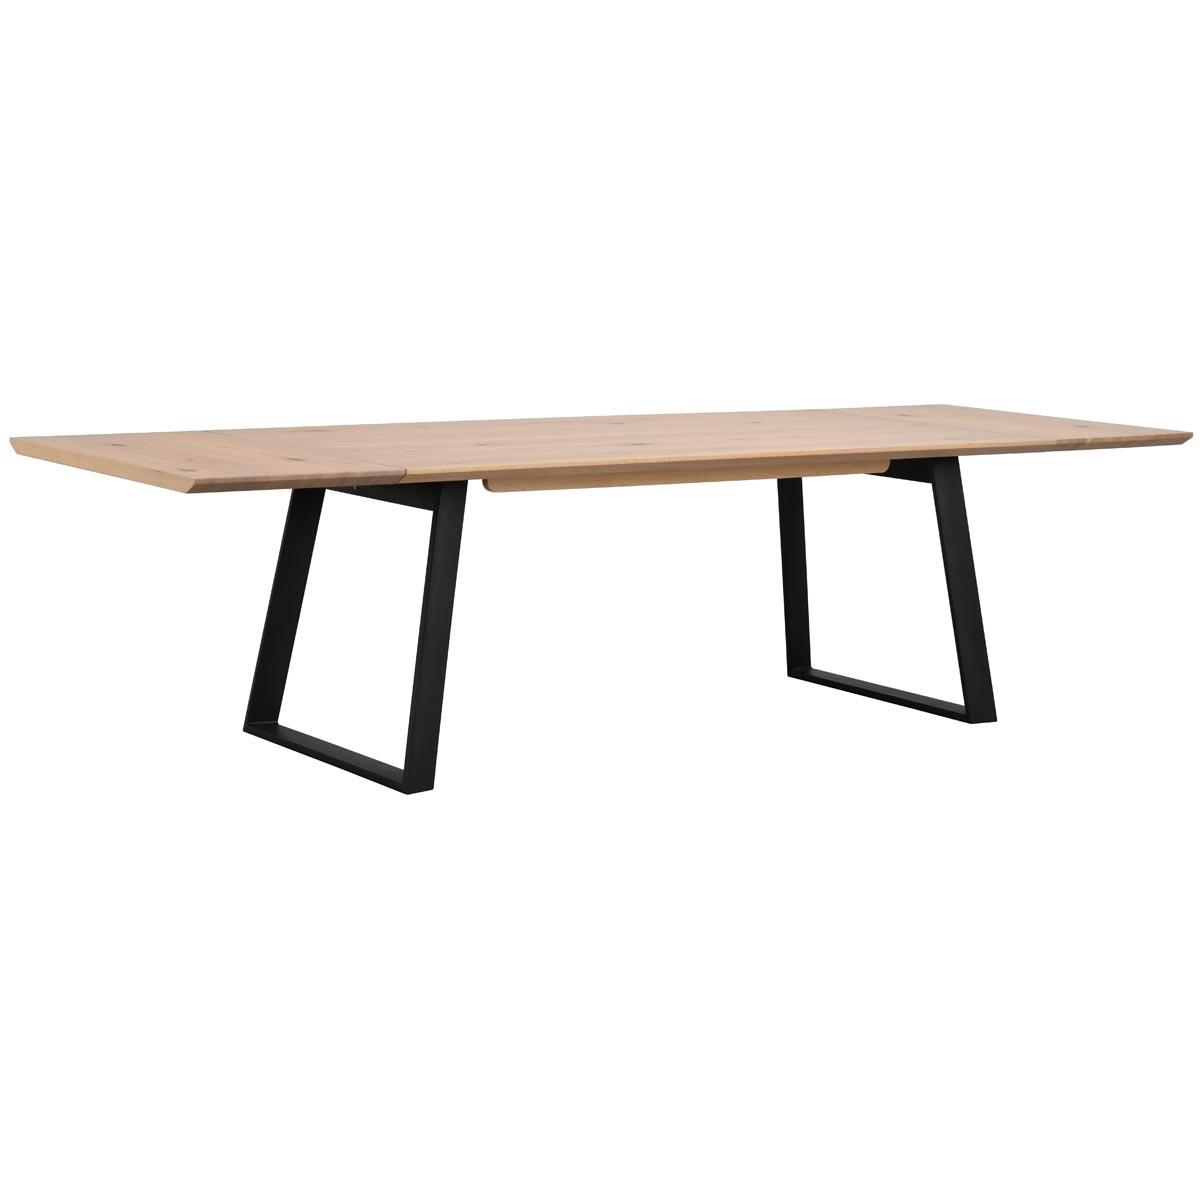 Melville-matbord-vitpigm-vildek-119370_b-tillaggsskivor